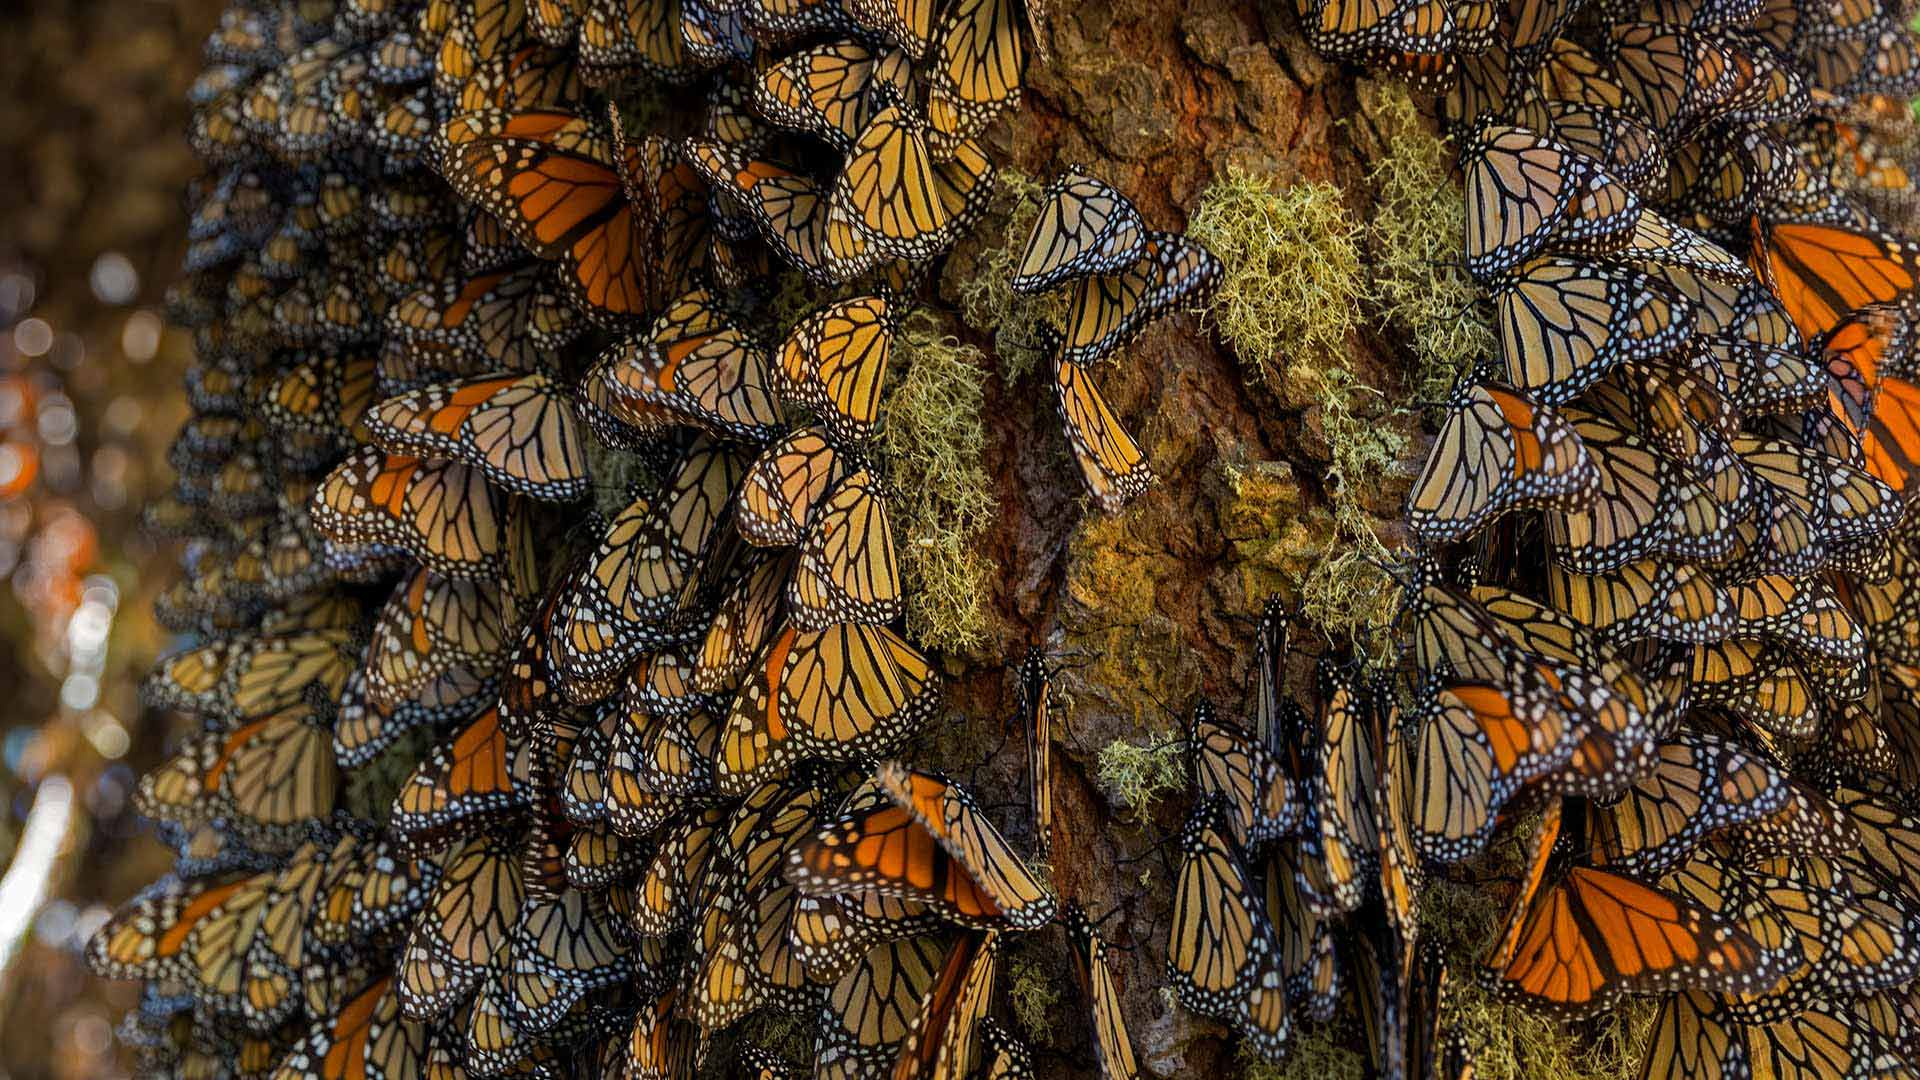 Monarch butterflies wintering in Michoacán, Mexico